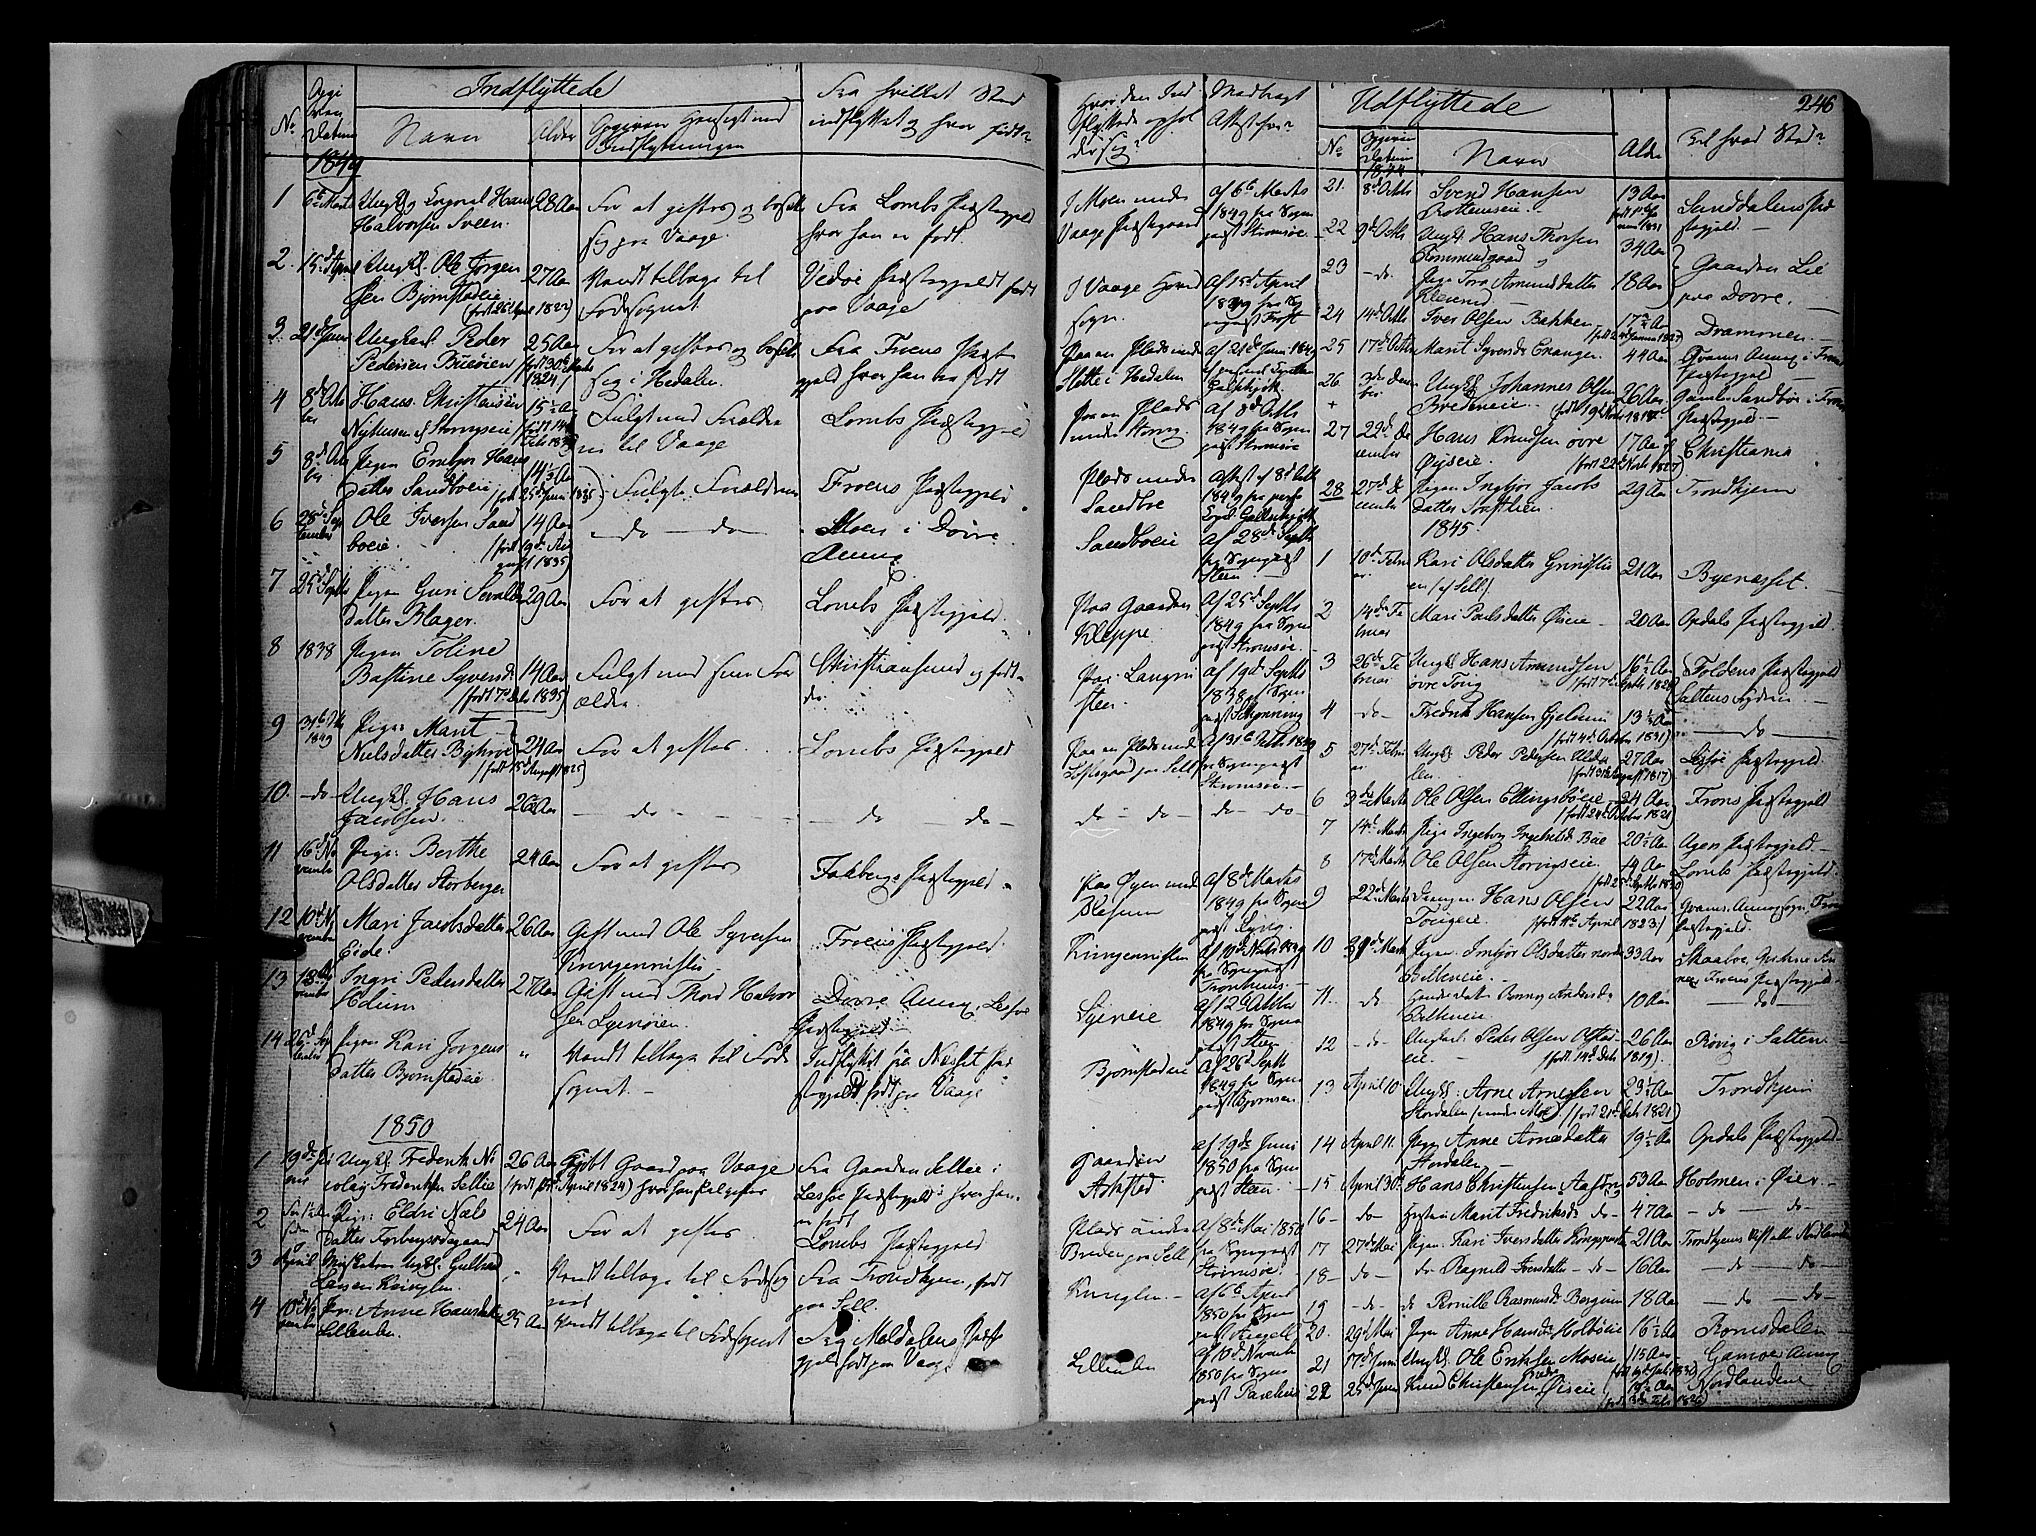 SAH, Vågå prestekontor, Ministerialbok nr. 5 /1, 1842-1856, s. 246